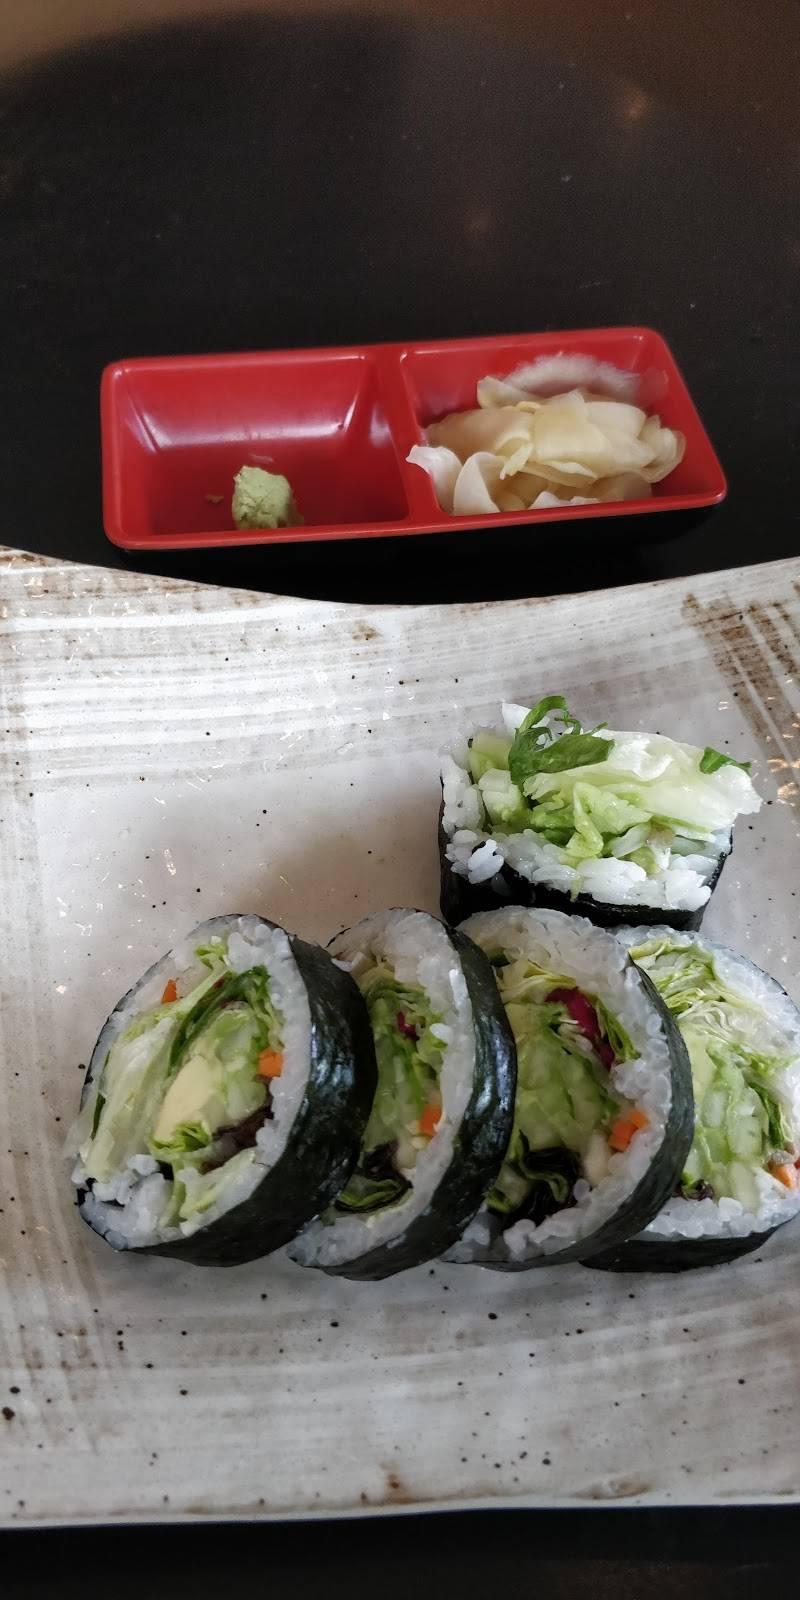 Edo Sushi | restaurant | 8895 Towne Centre Dr #100A, San Diego, CA 92122, USA | 8584574455 OR +1 858-457-4455